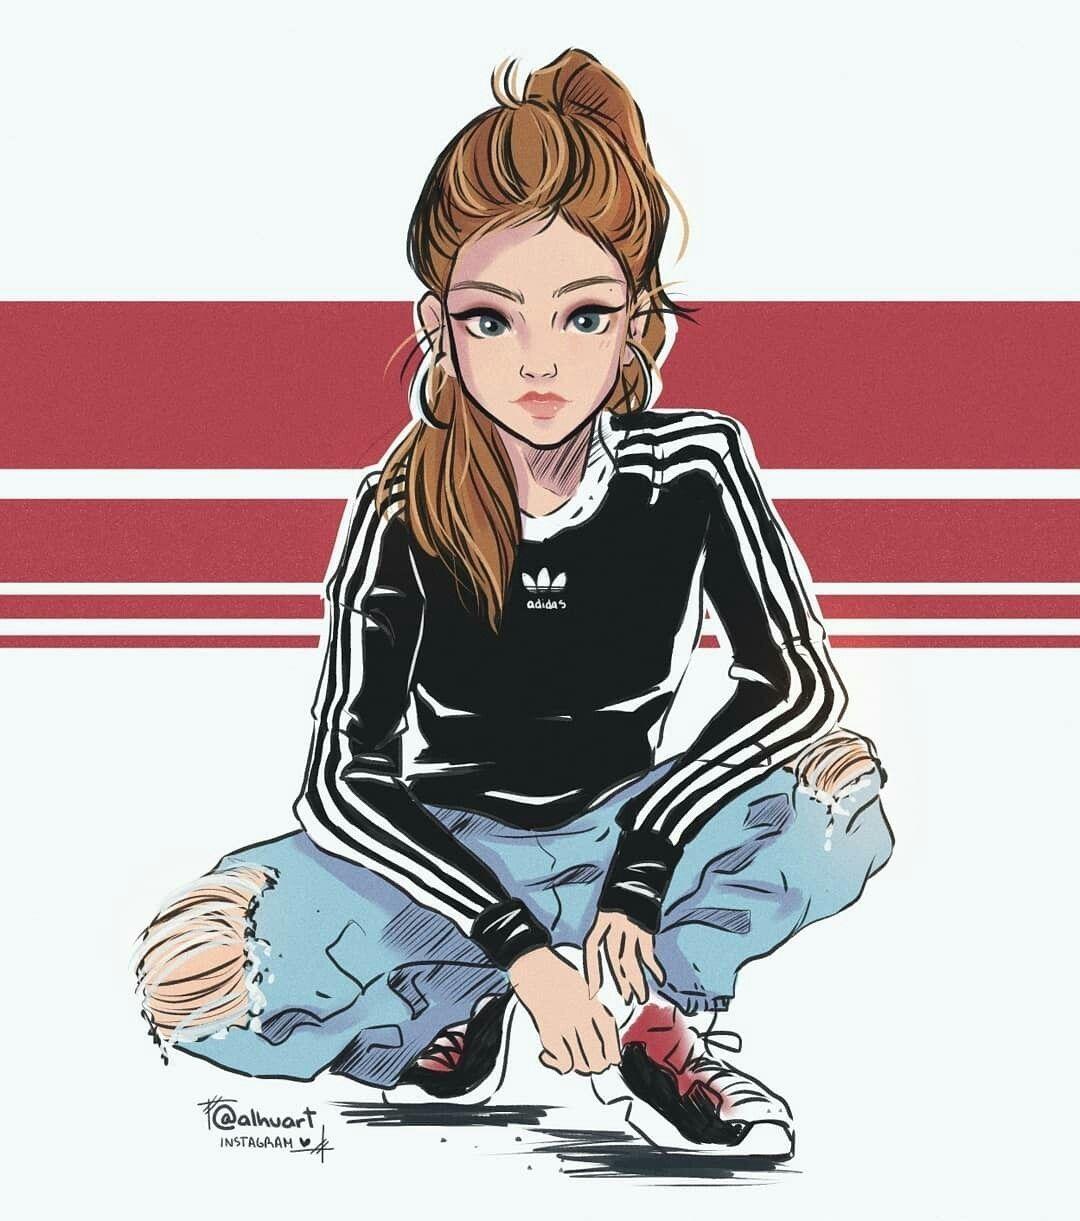 Pin By Nrltamaulida On Amazing Girls Cartoon Art Cartoon Girl Drawing Cartoon Art Styles